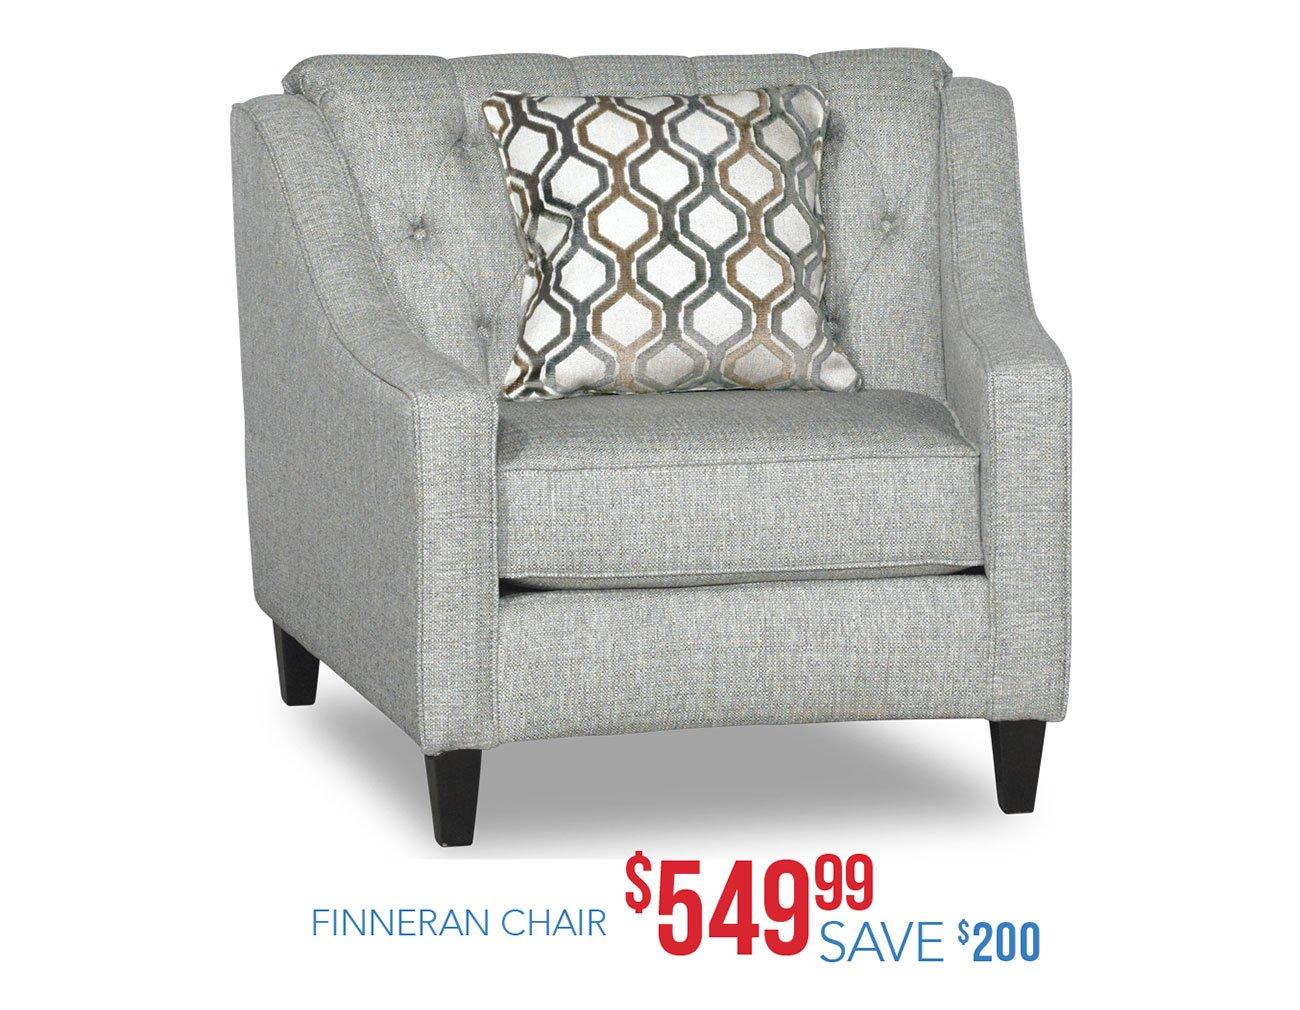 Finneran-chair